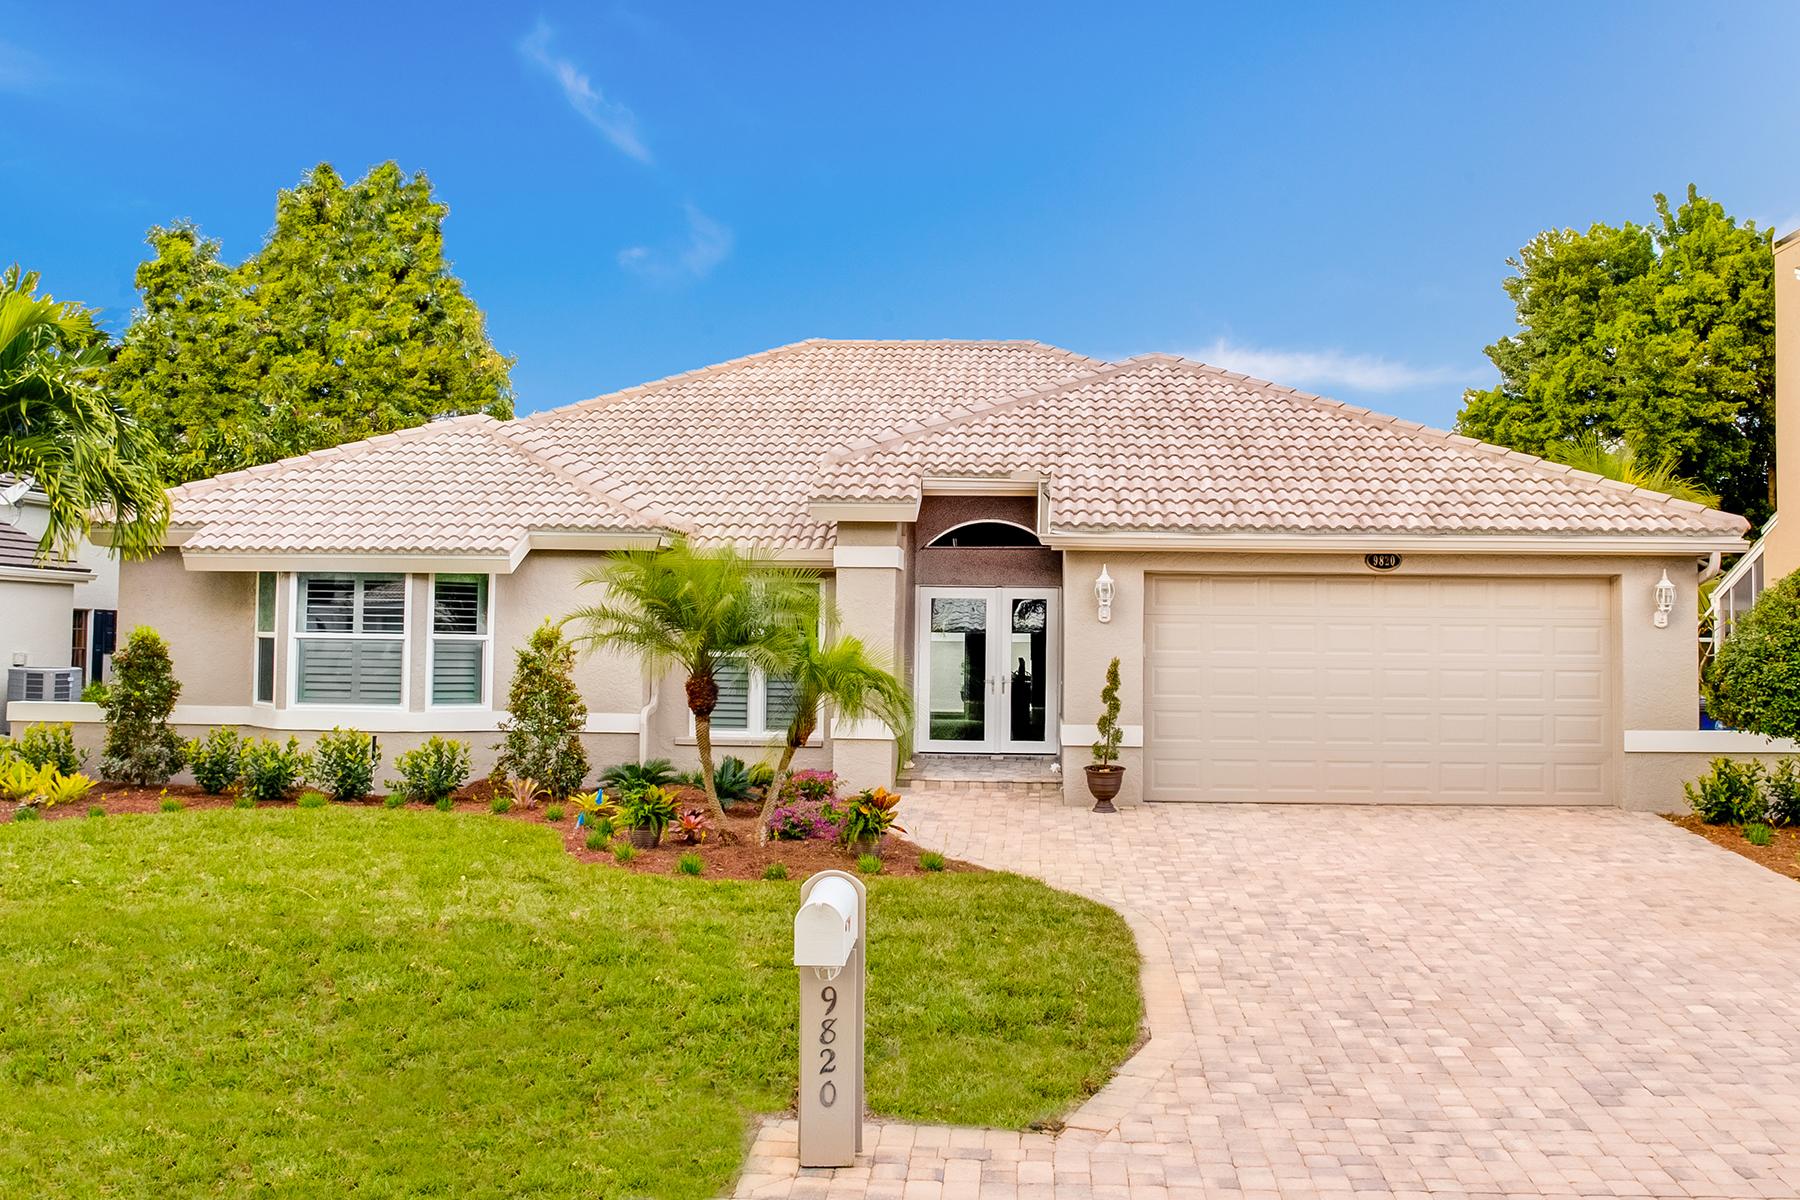 Villa per Vendita alle ore FOR MYES 9820 Capstan Ct Fort Myers, Florida, 33919 Stati Uniti